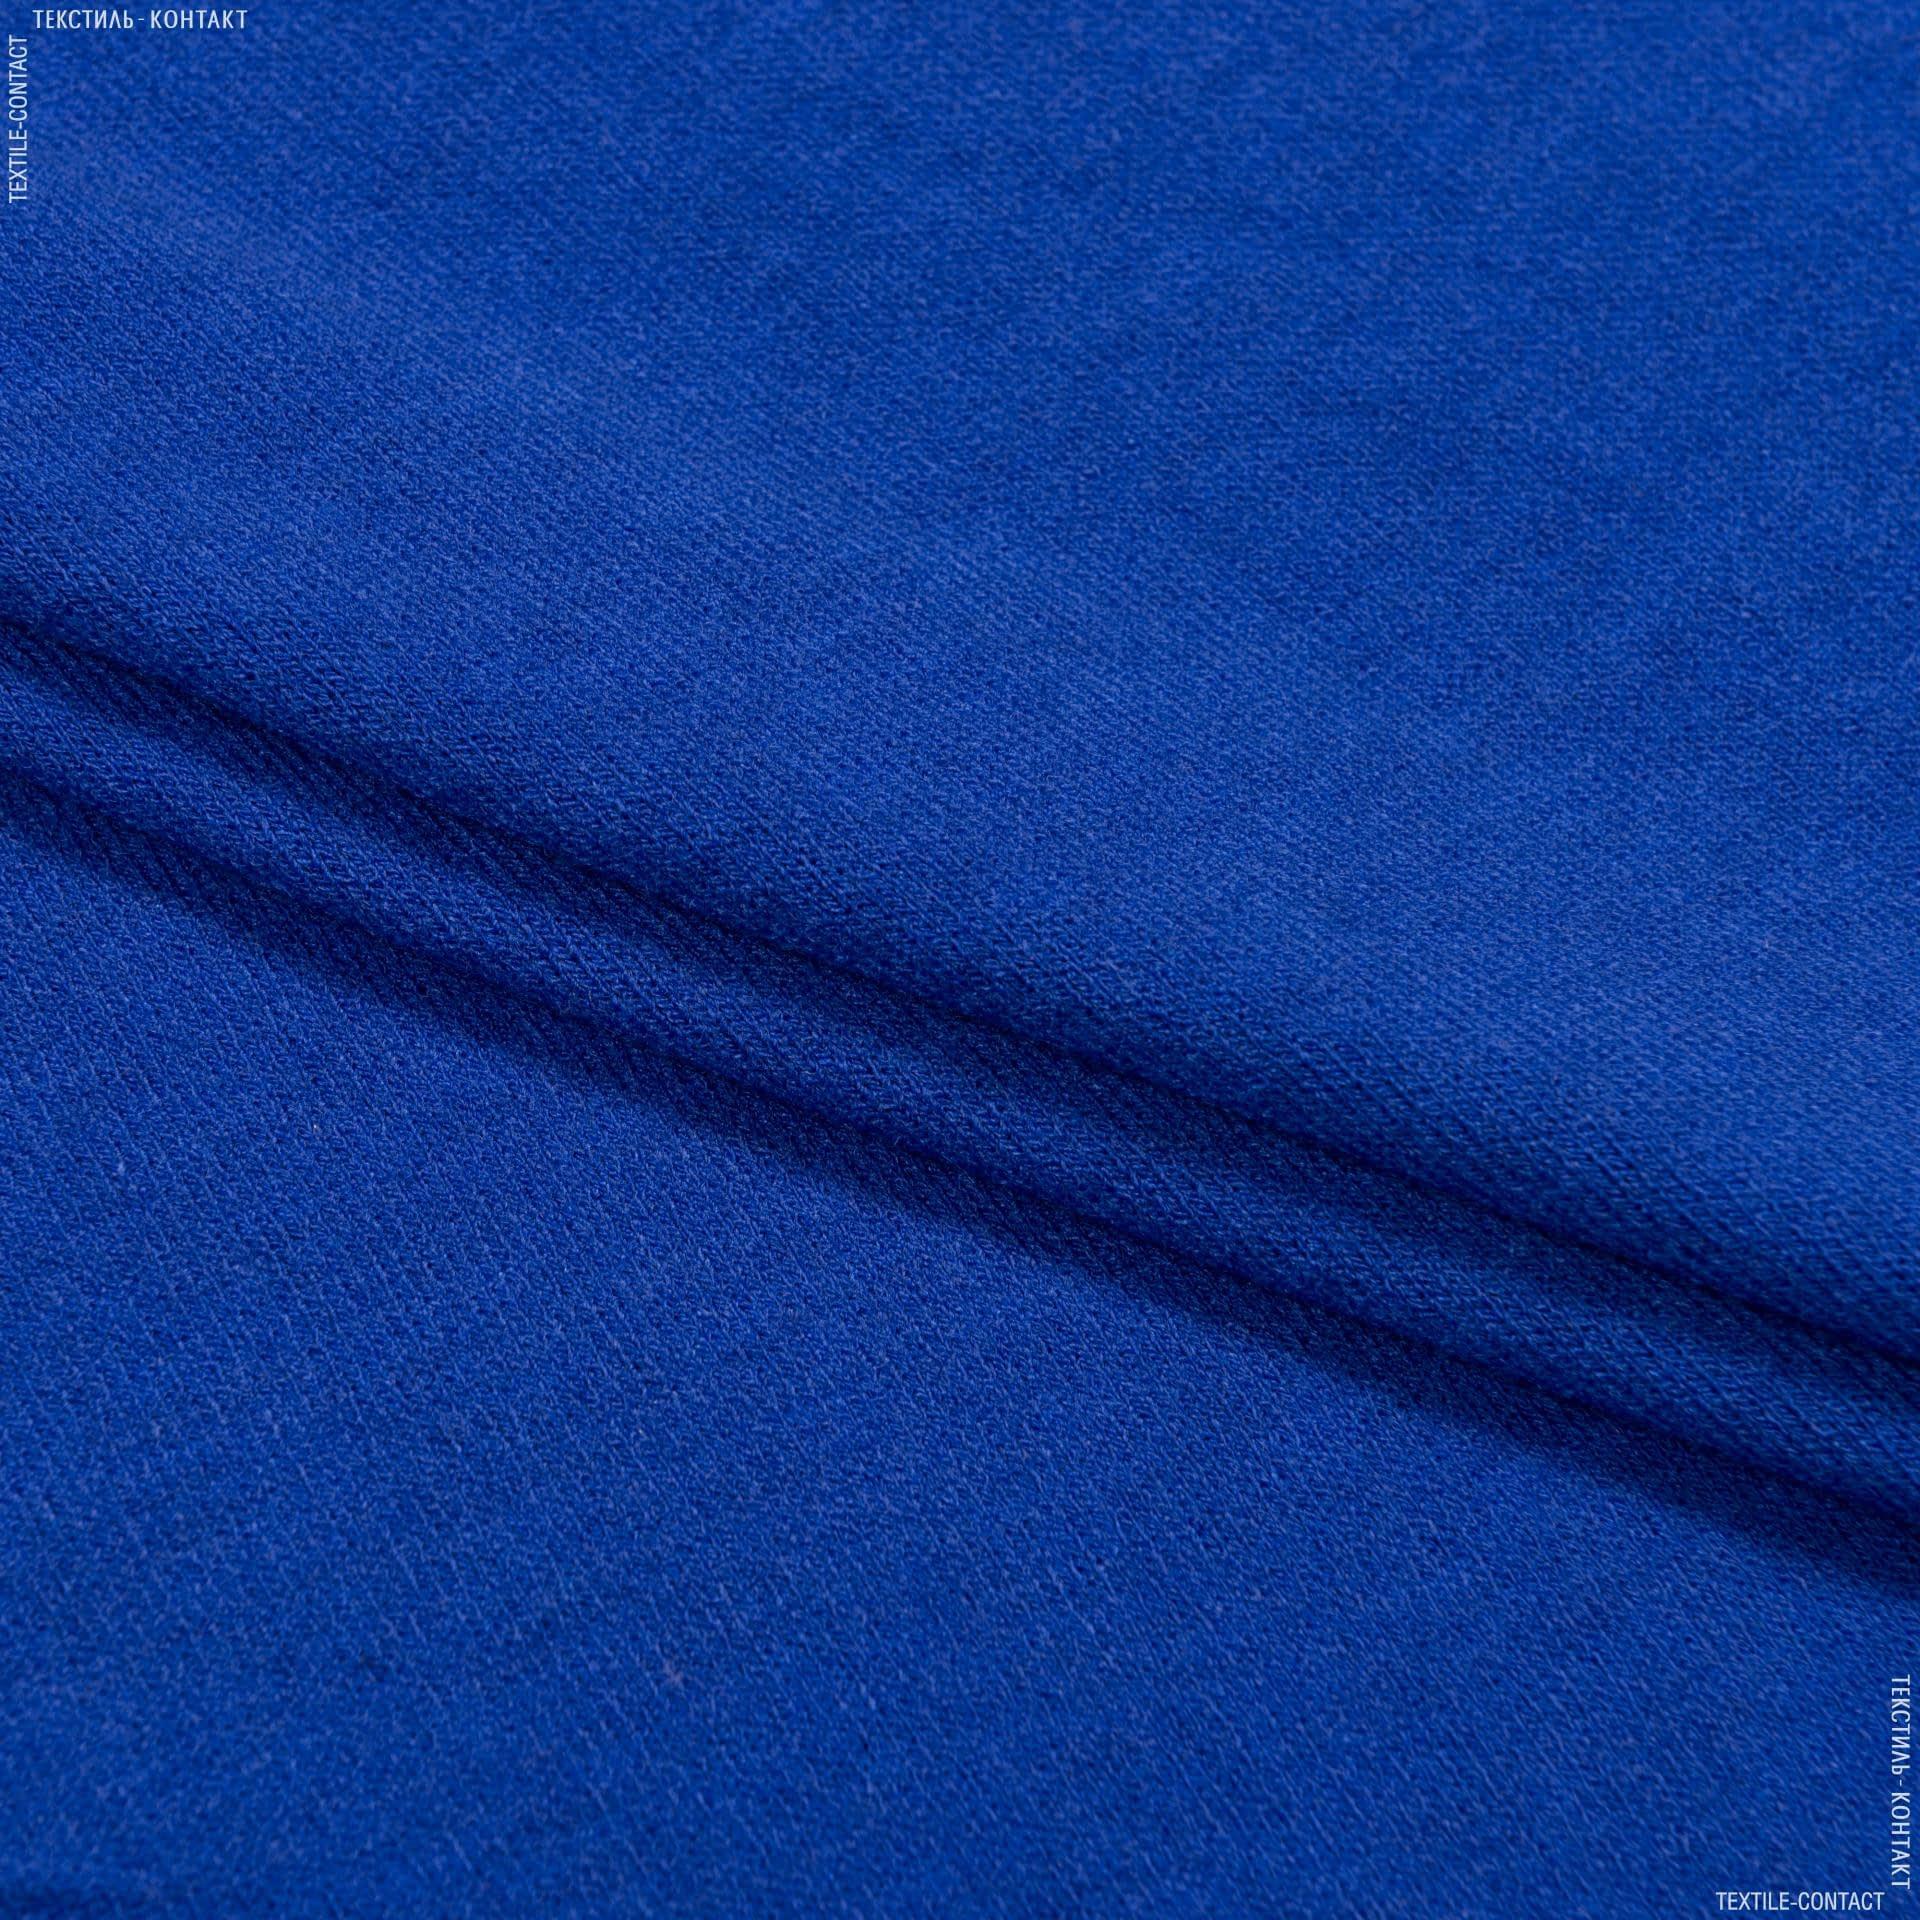 Ткани для костюмов - Трикотаж ангора электрик